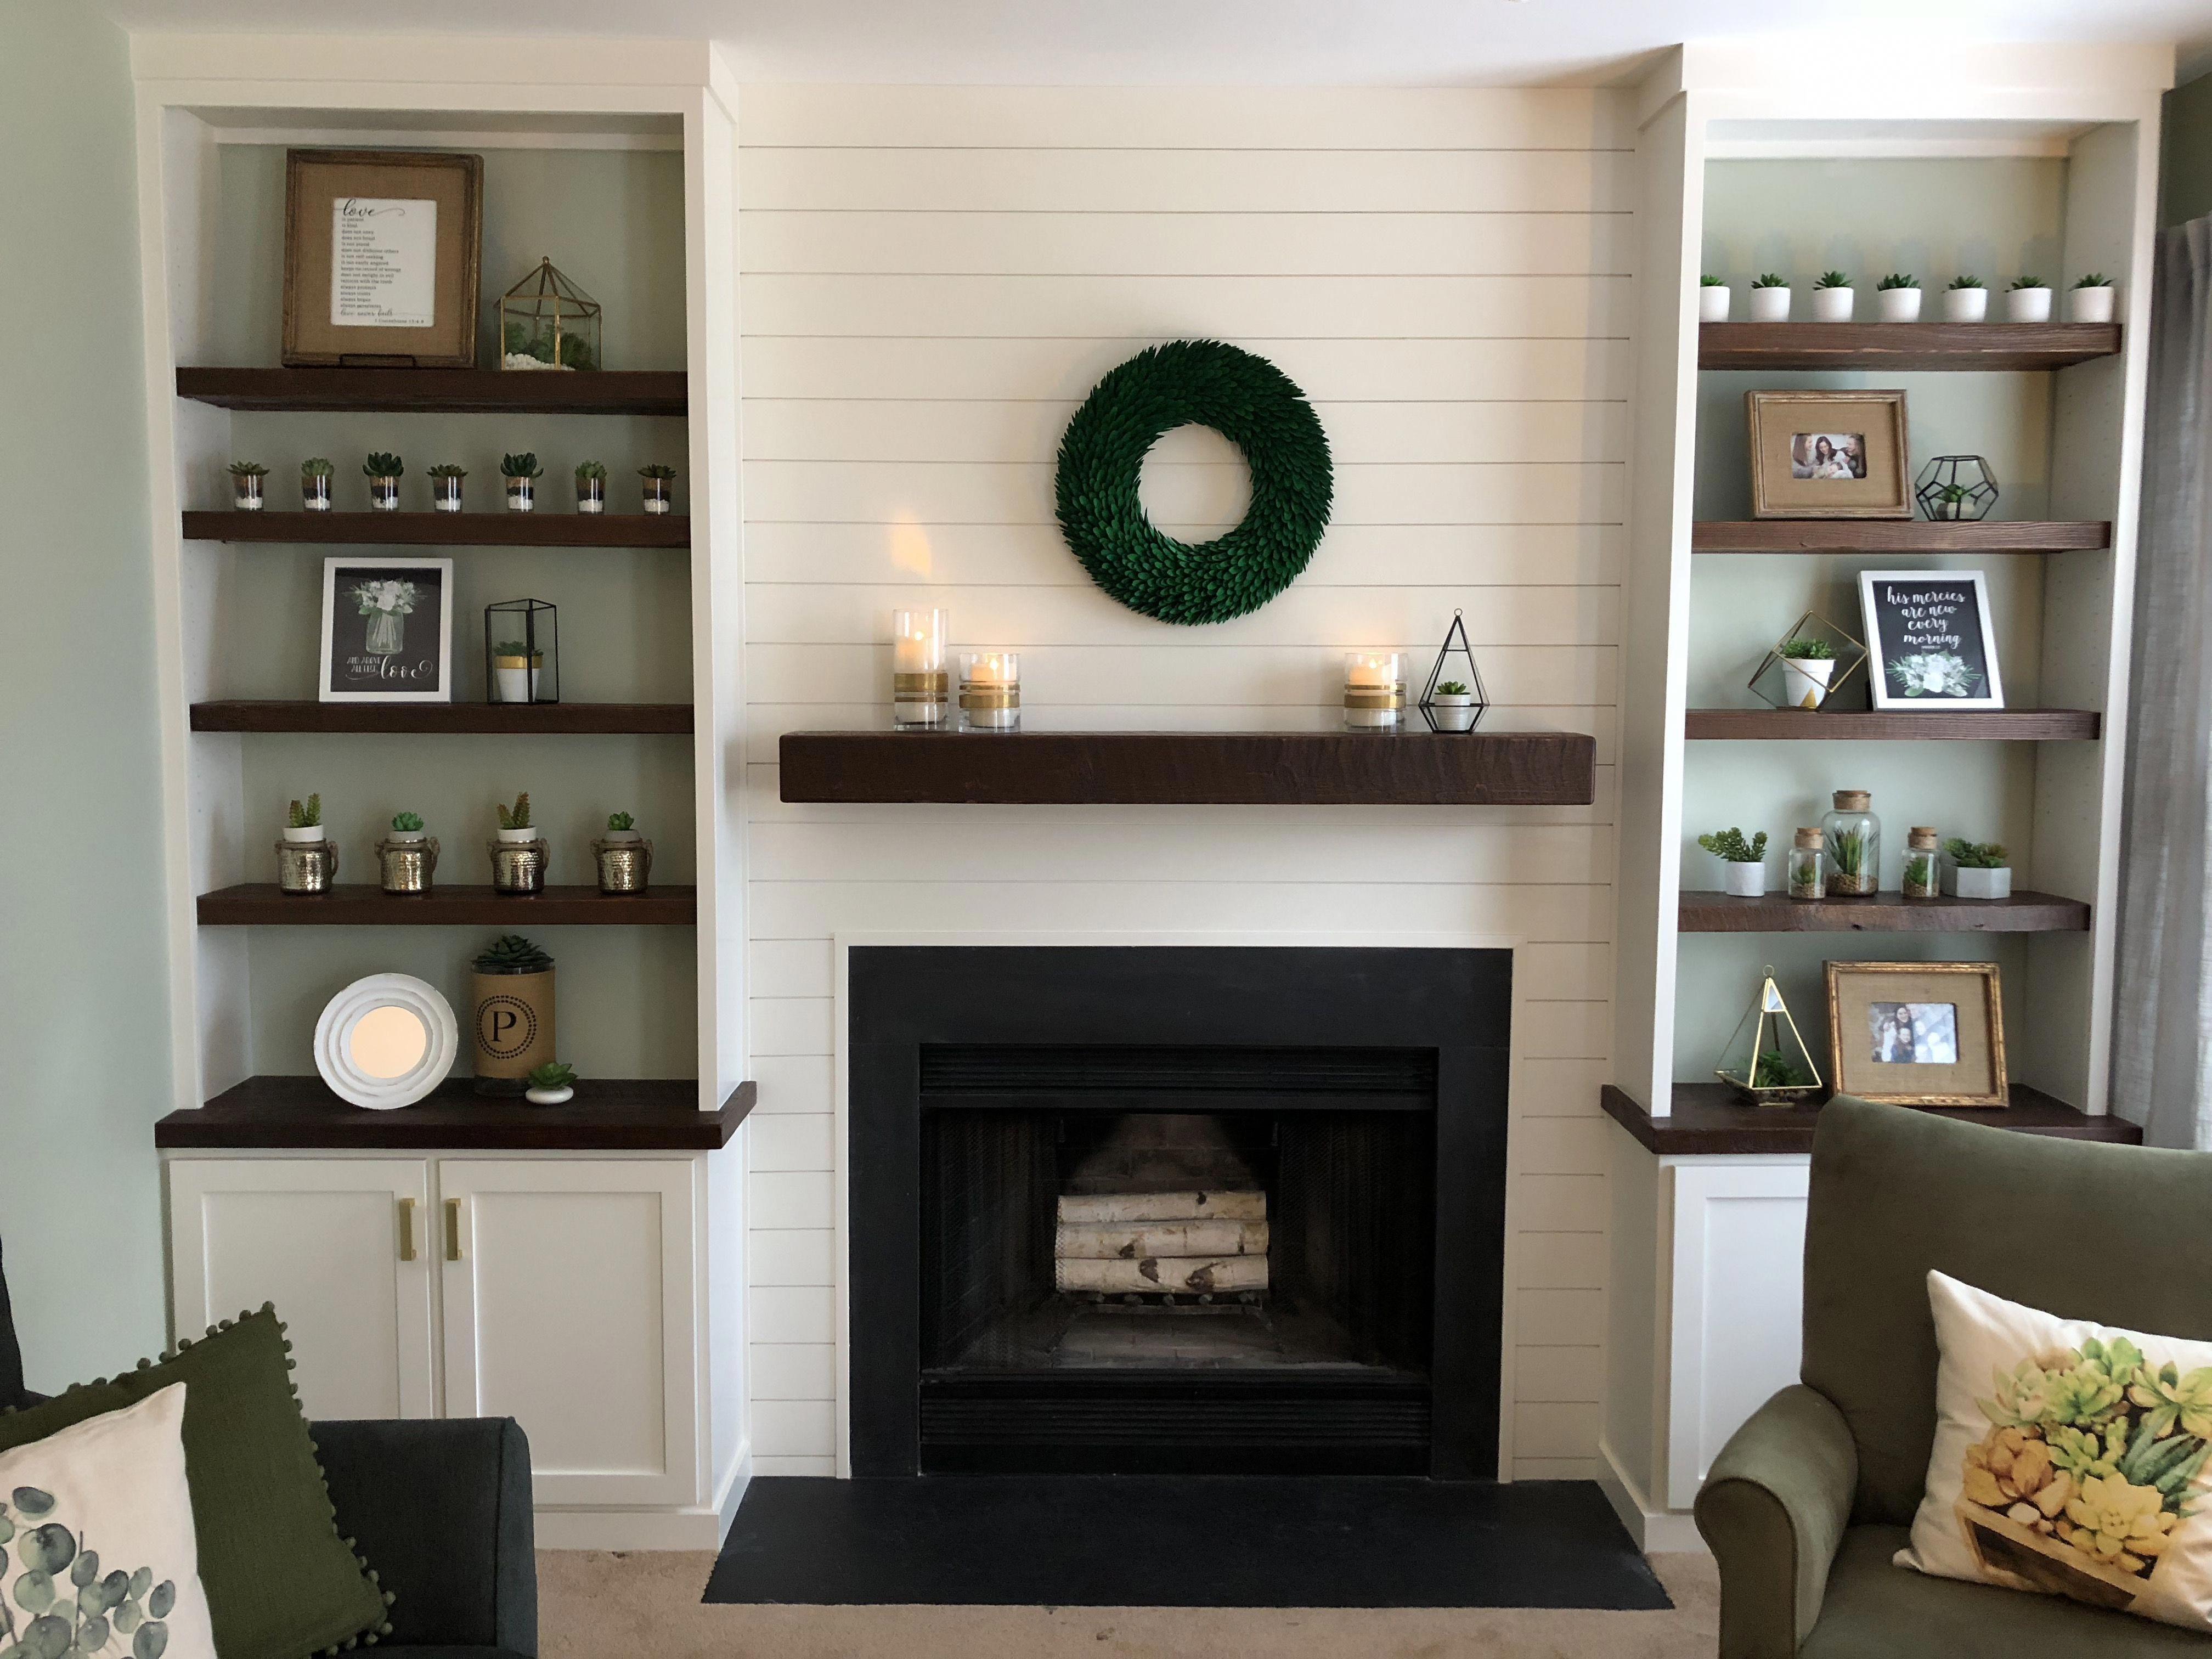 Captivating basement renovation on a budget freestanding